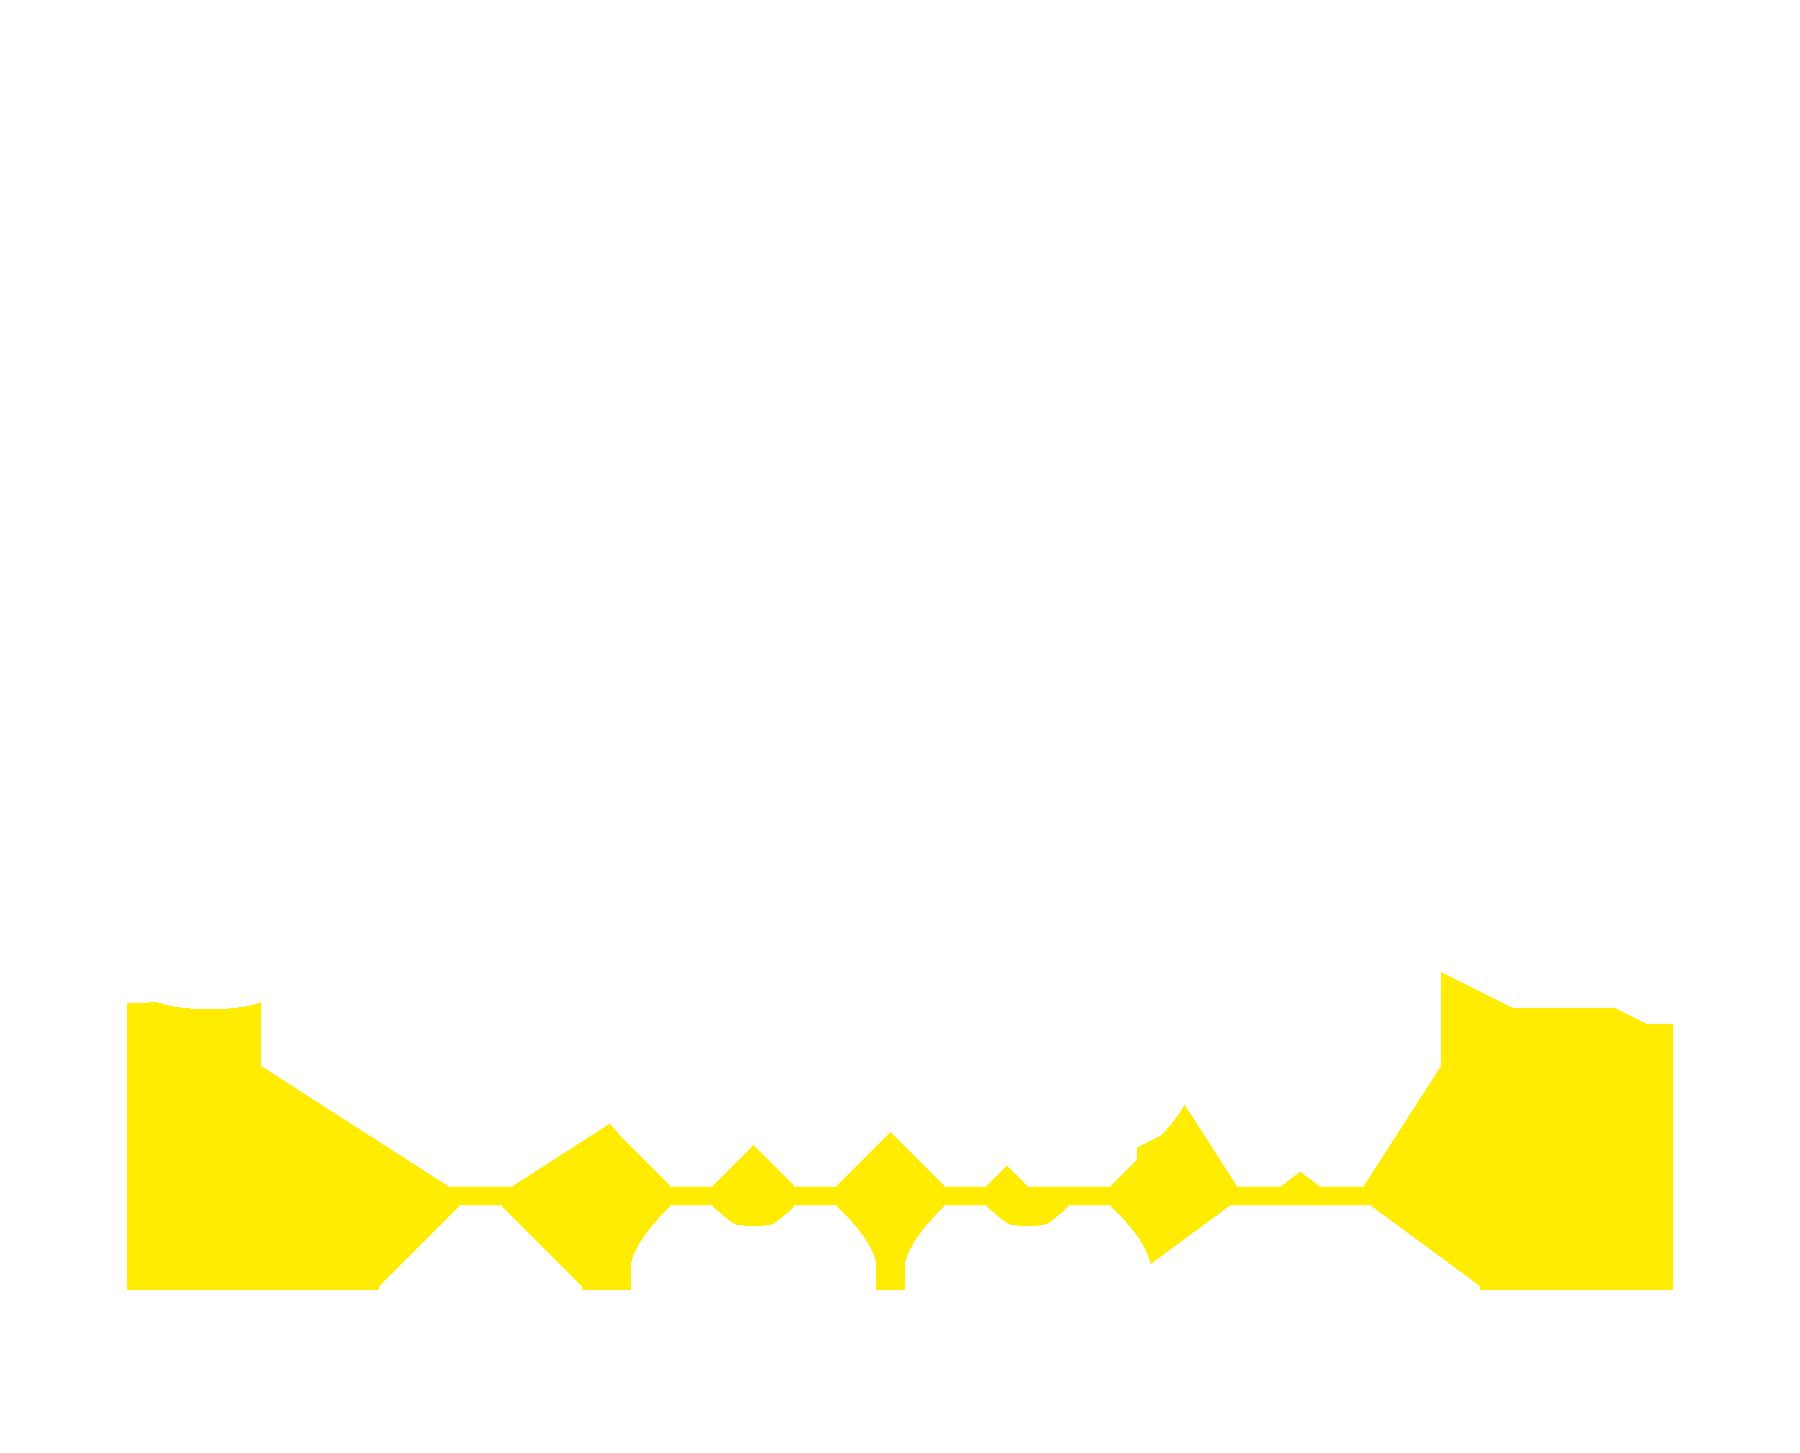 SSY-logo-white-yellow.png